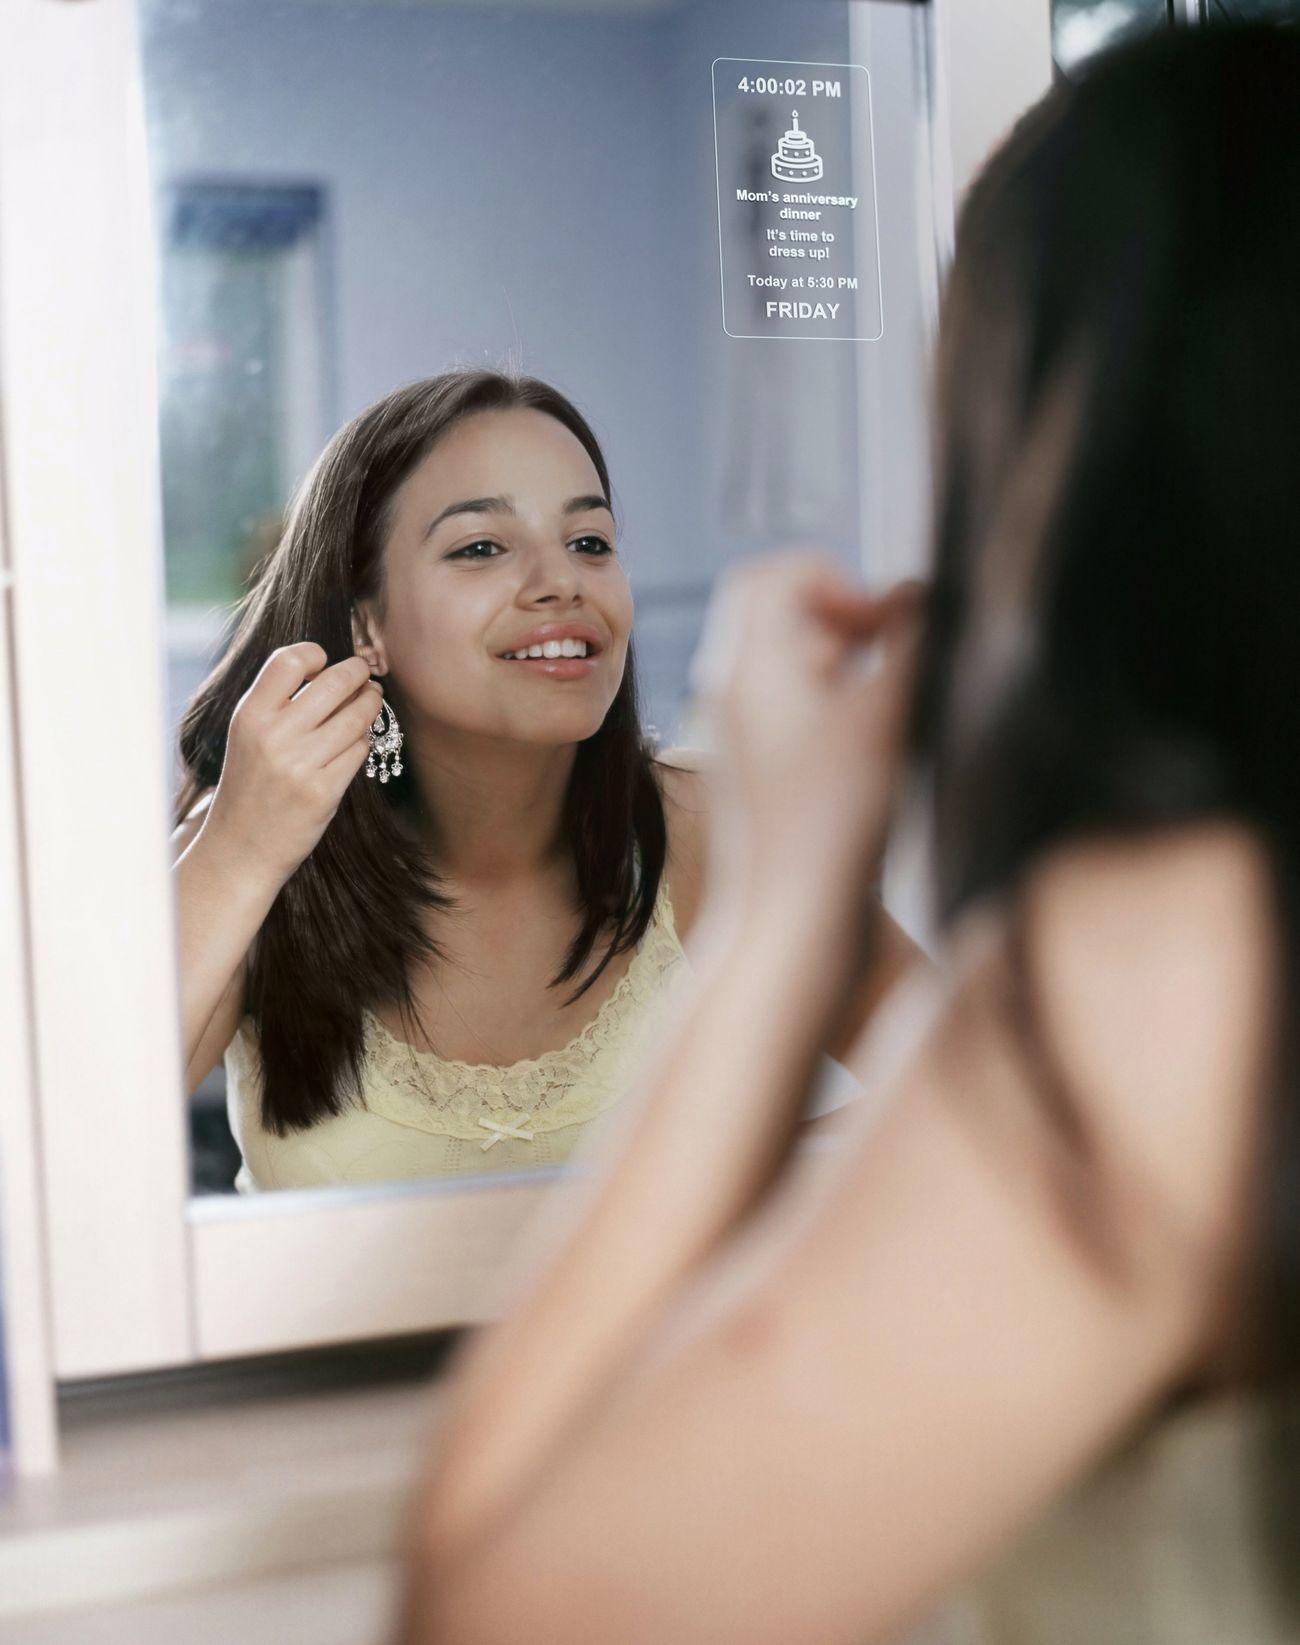 MirroCool Personal Assistant Smart Mirror